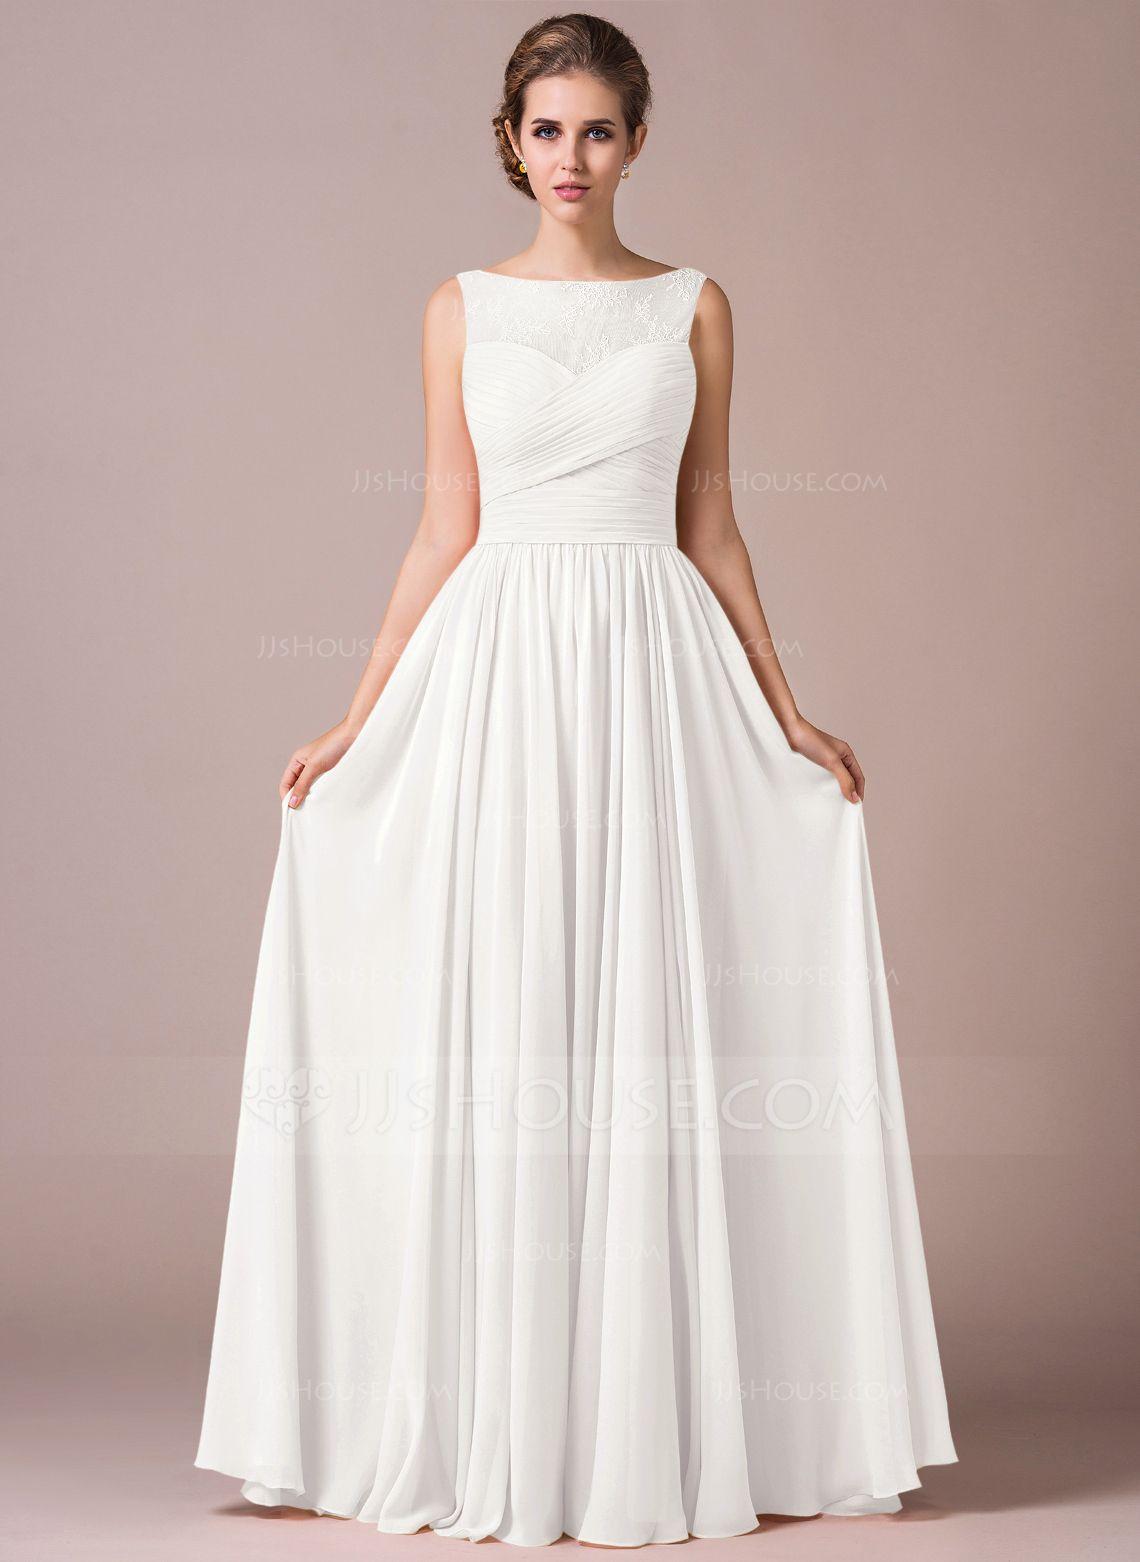 Wedding dresses springfield mo  Chiffon Lace ALine Floorlength Bridesmaid Dress  Lace bridesmaids